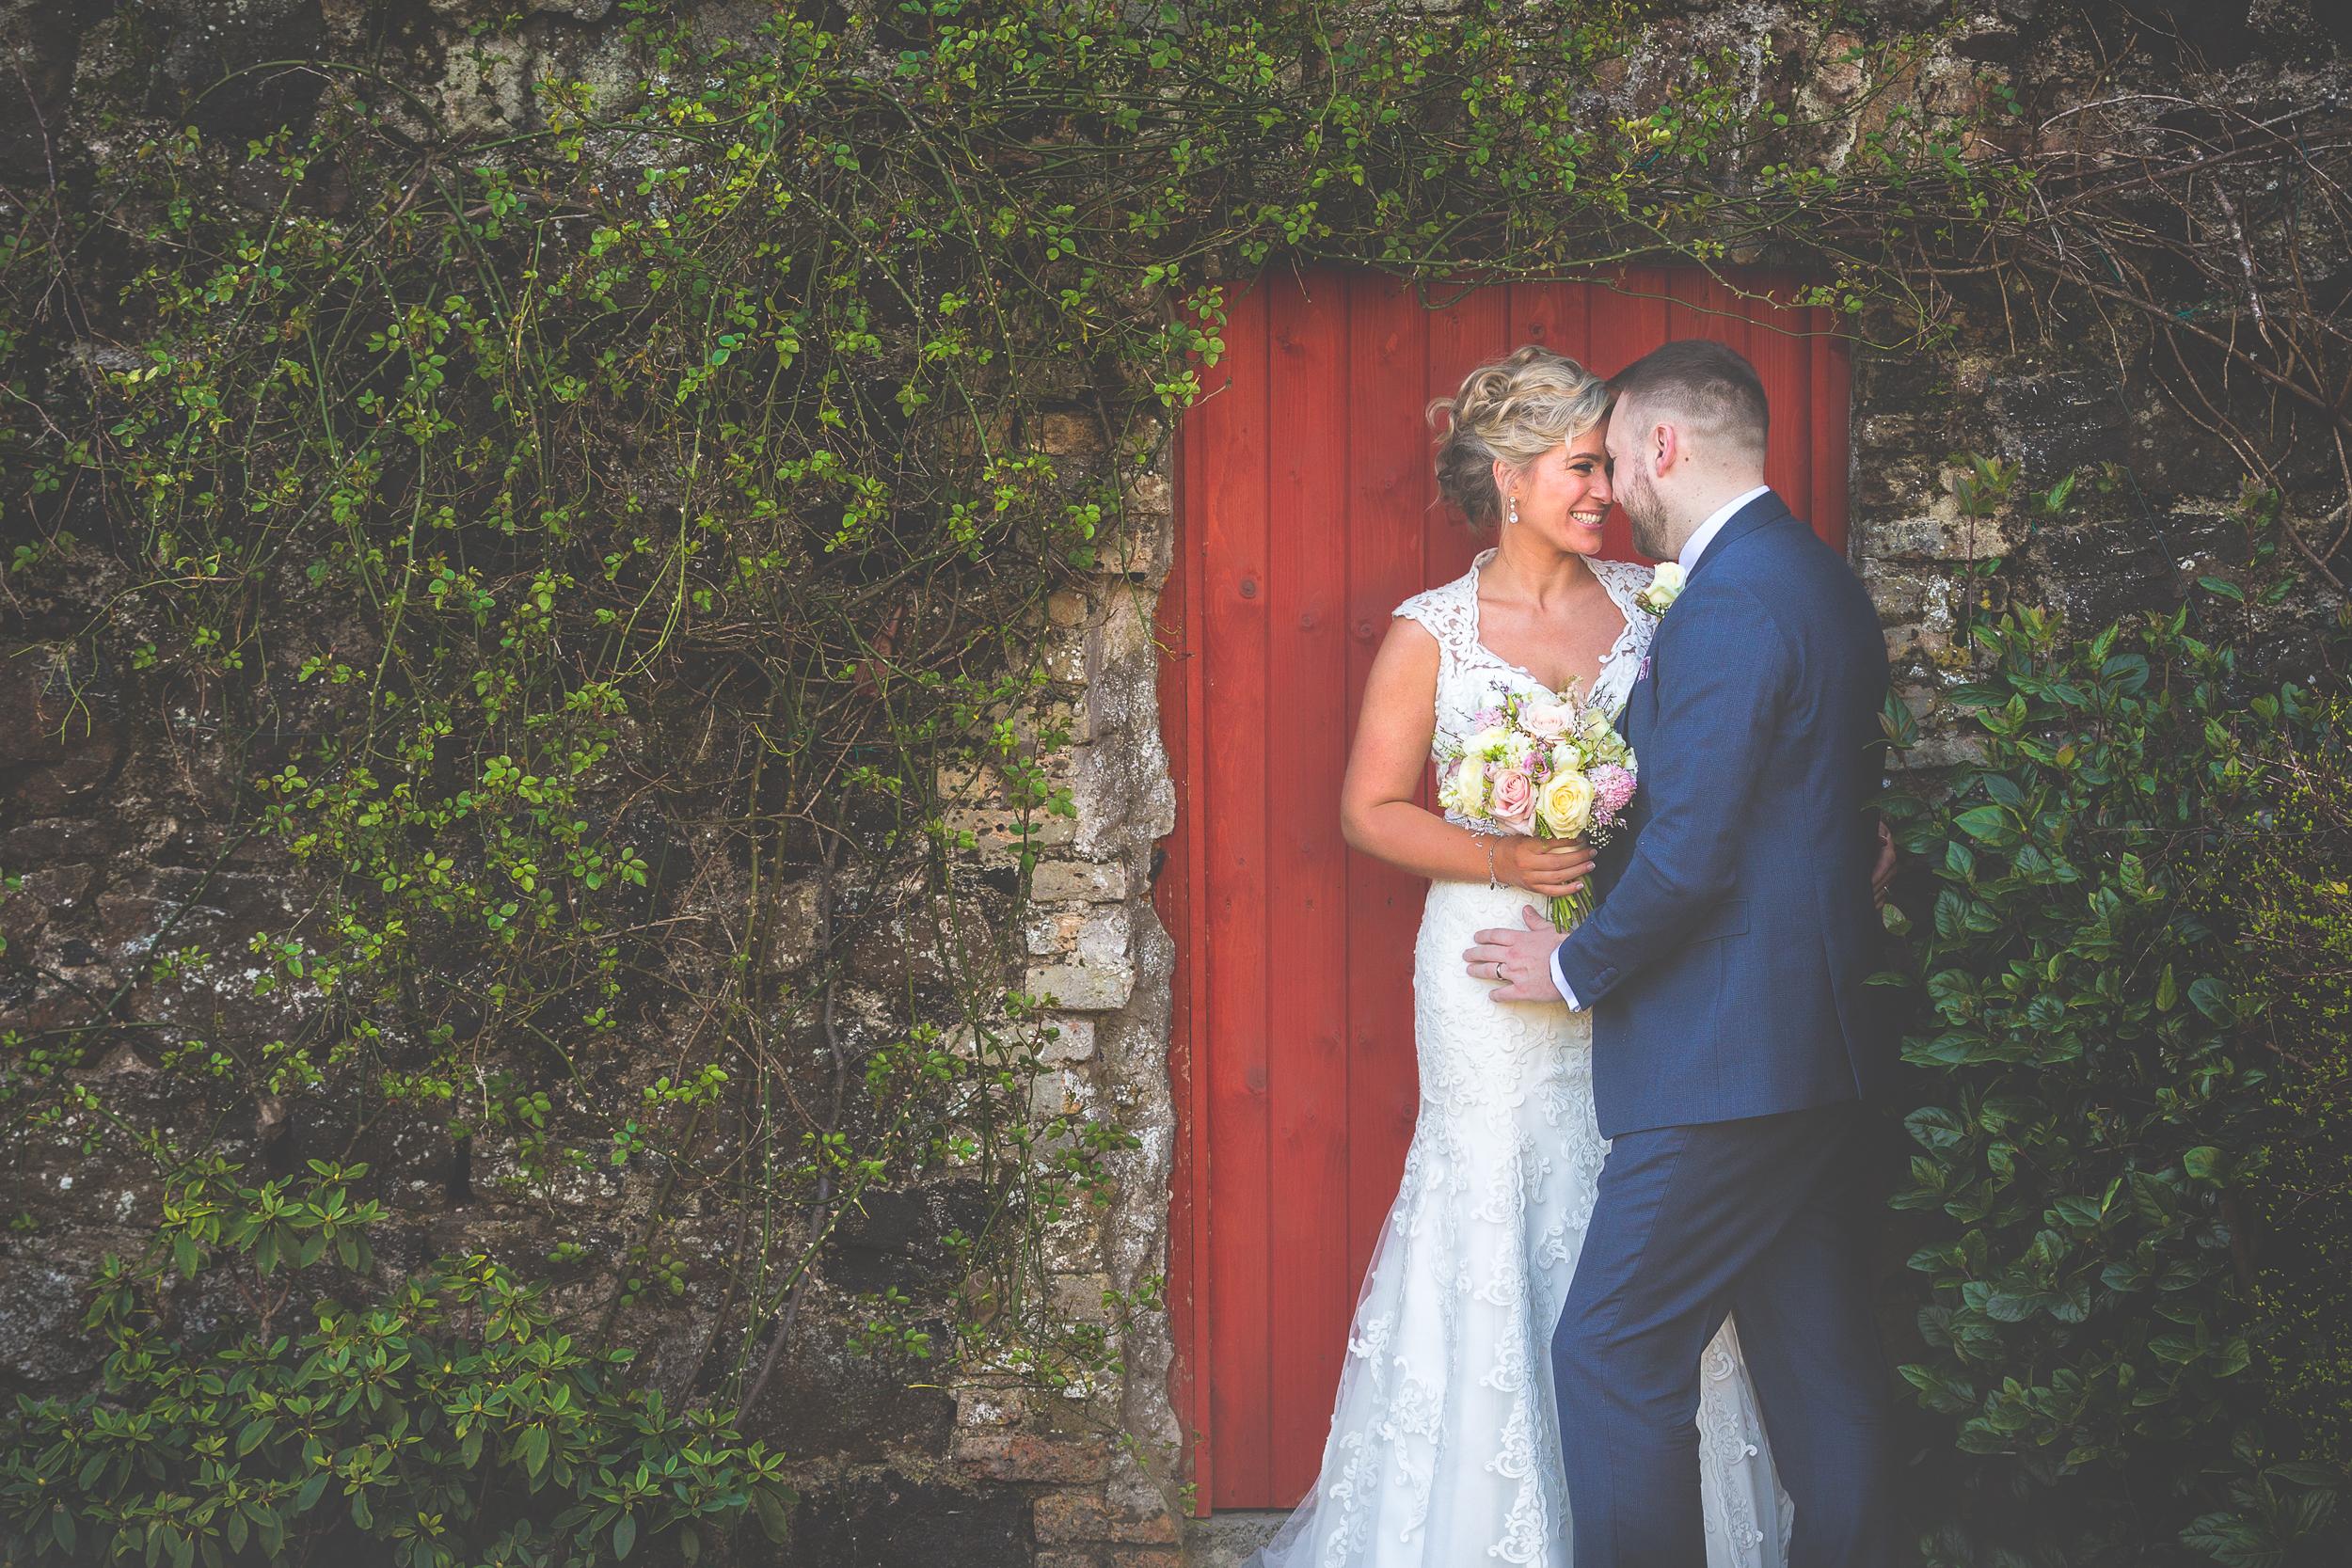 northern ireland wedding photography | NI wedding Photographer | Brian McEwan | Bride & Groom at Tullyglass Hotel